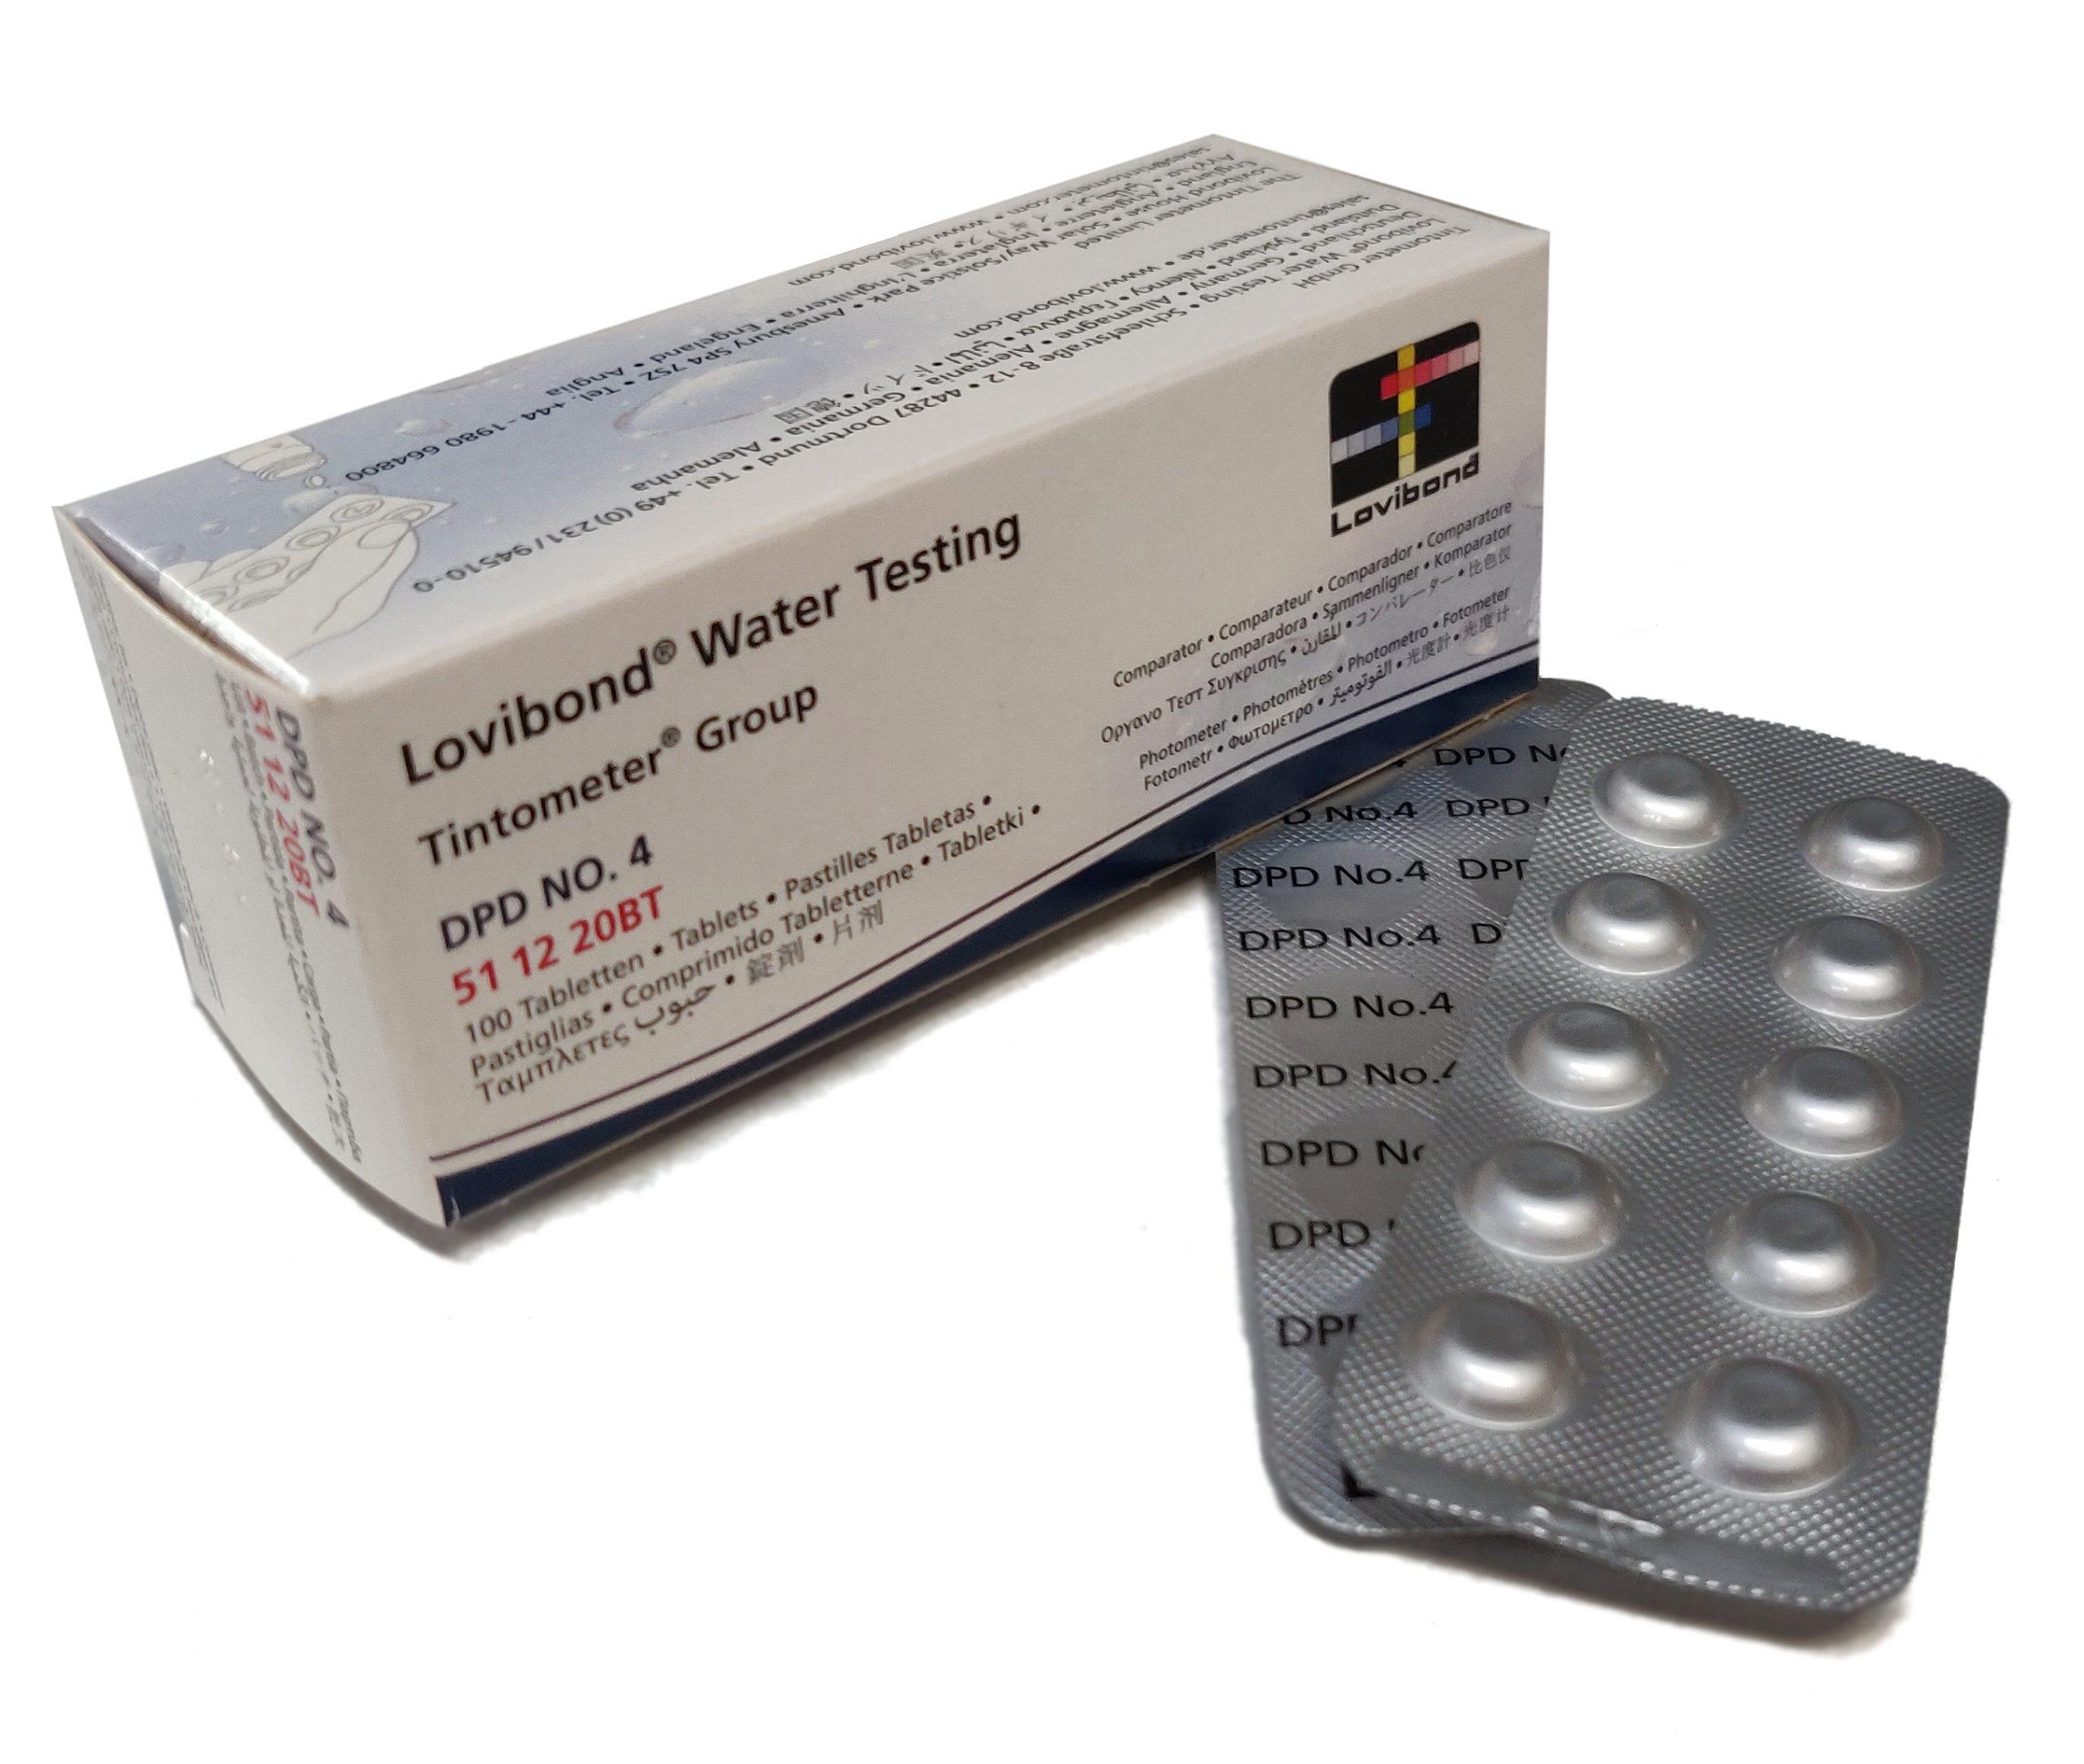 DPD Nr. 4, Aktiv Oksygen 0,1-10 mg/l (Photometer)